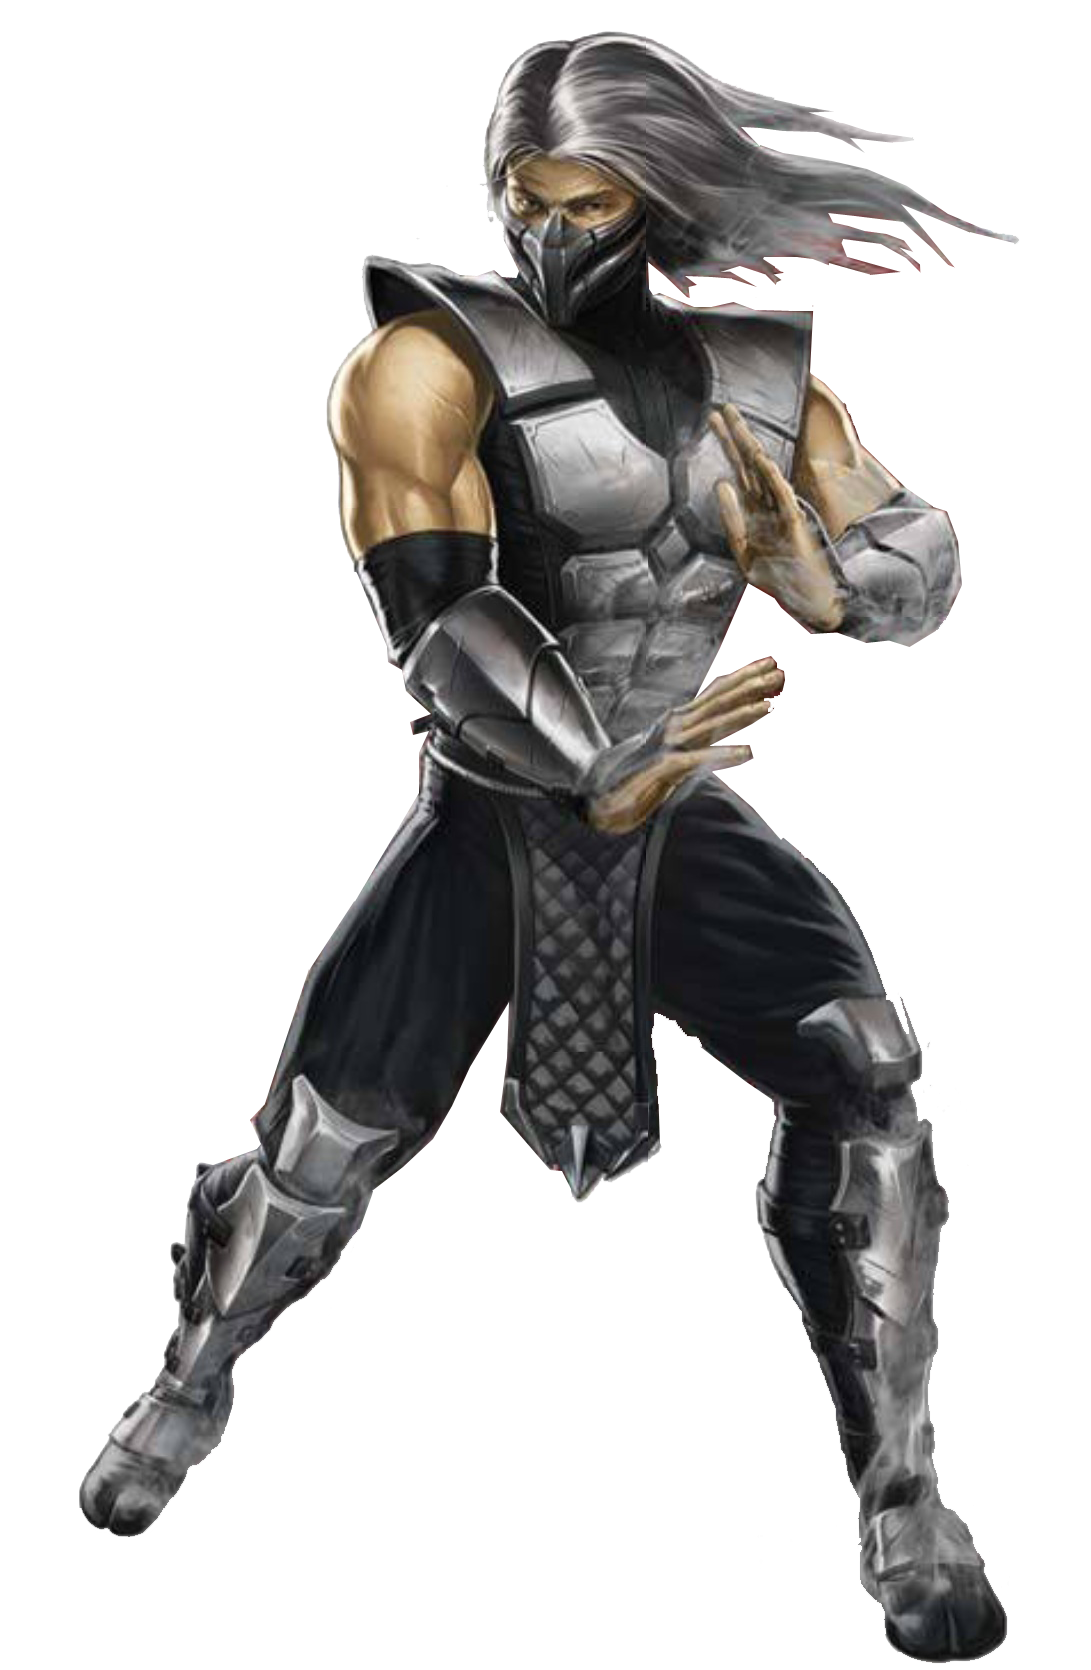 I Got Have Smoke On Here Too Mortal Kombat Mortal Kombat